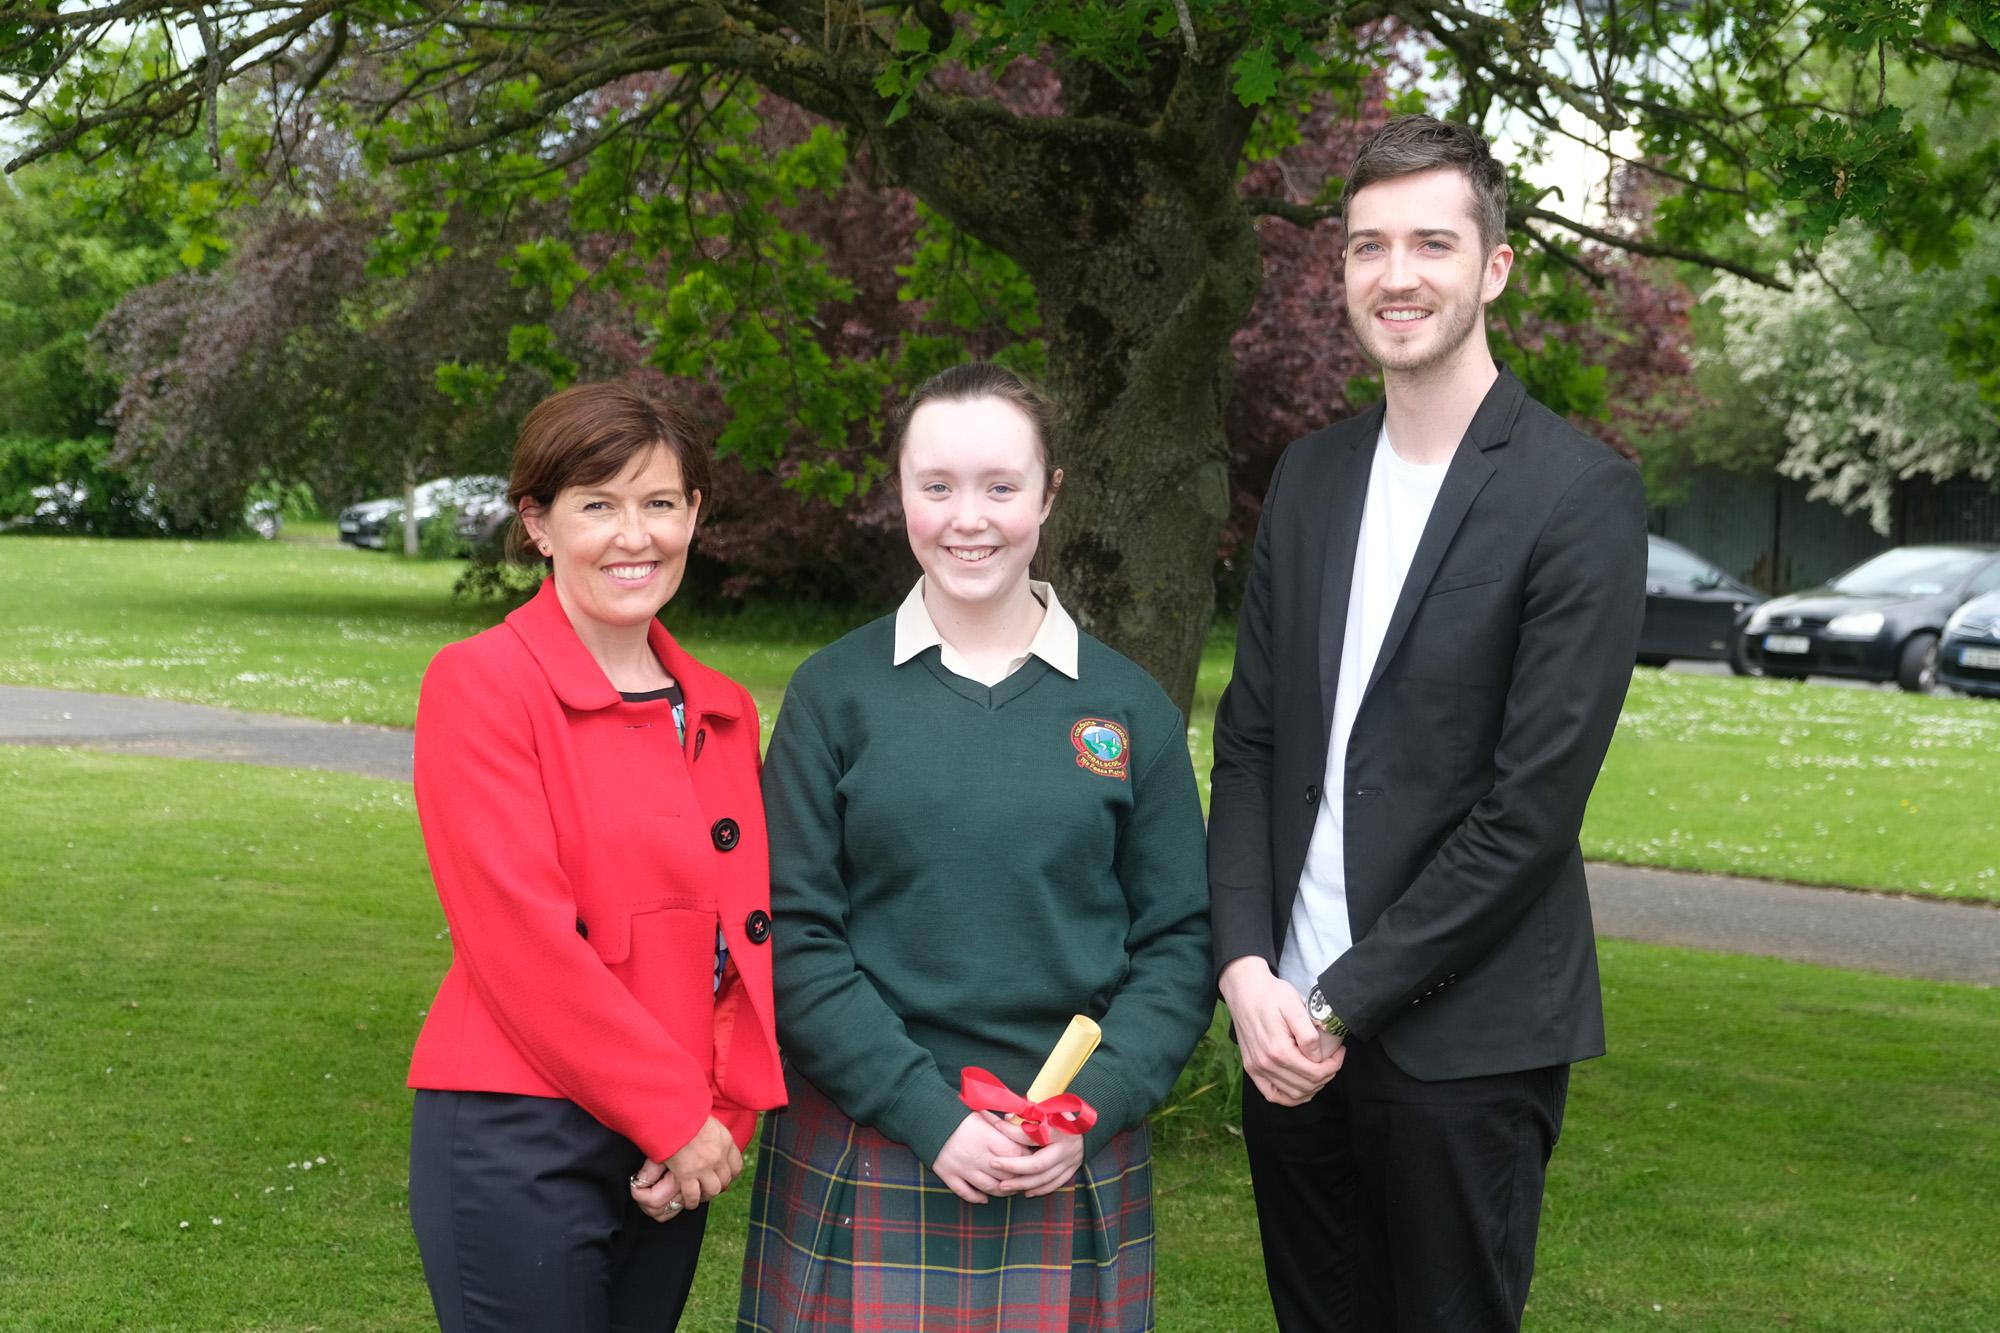 Spirit of Colaiste Chiarain  Louise Doran, Nia Dunne, Evan Kirwan.